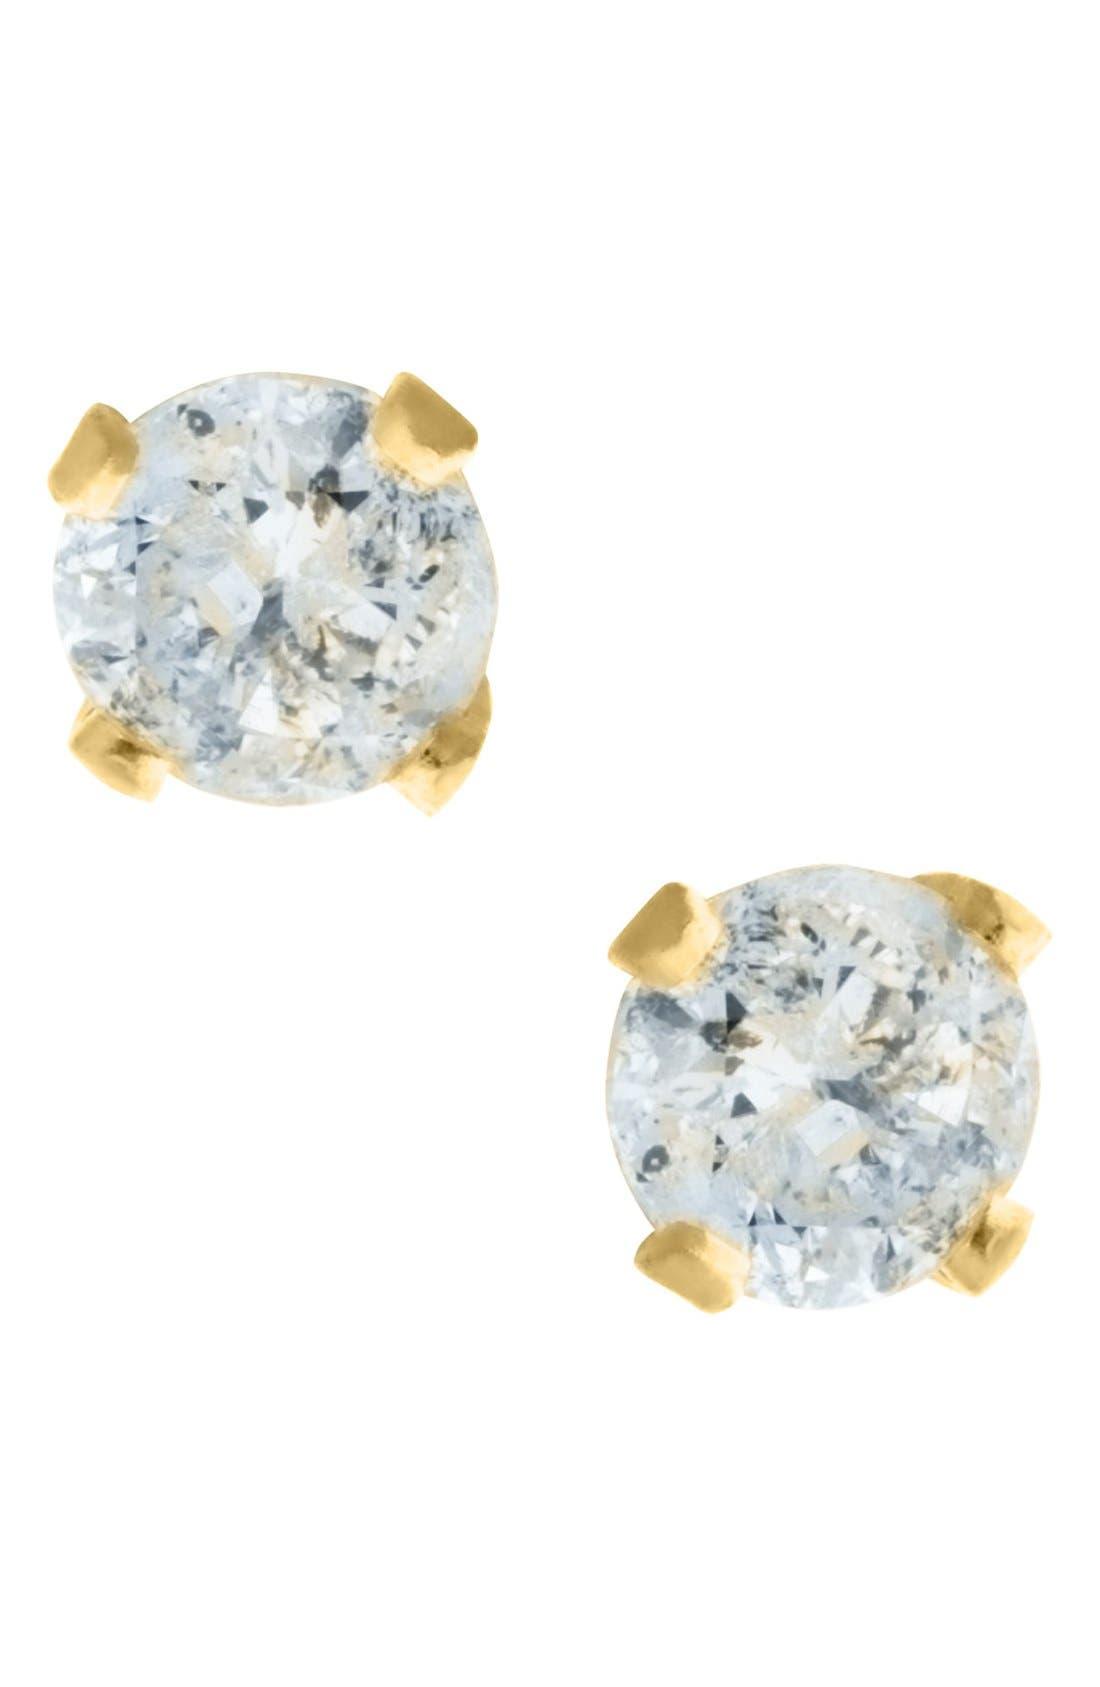 14k Yellow Gold & Diamond Stud Earrings,                         Main,                         color, GOLD